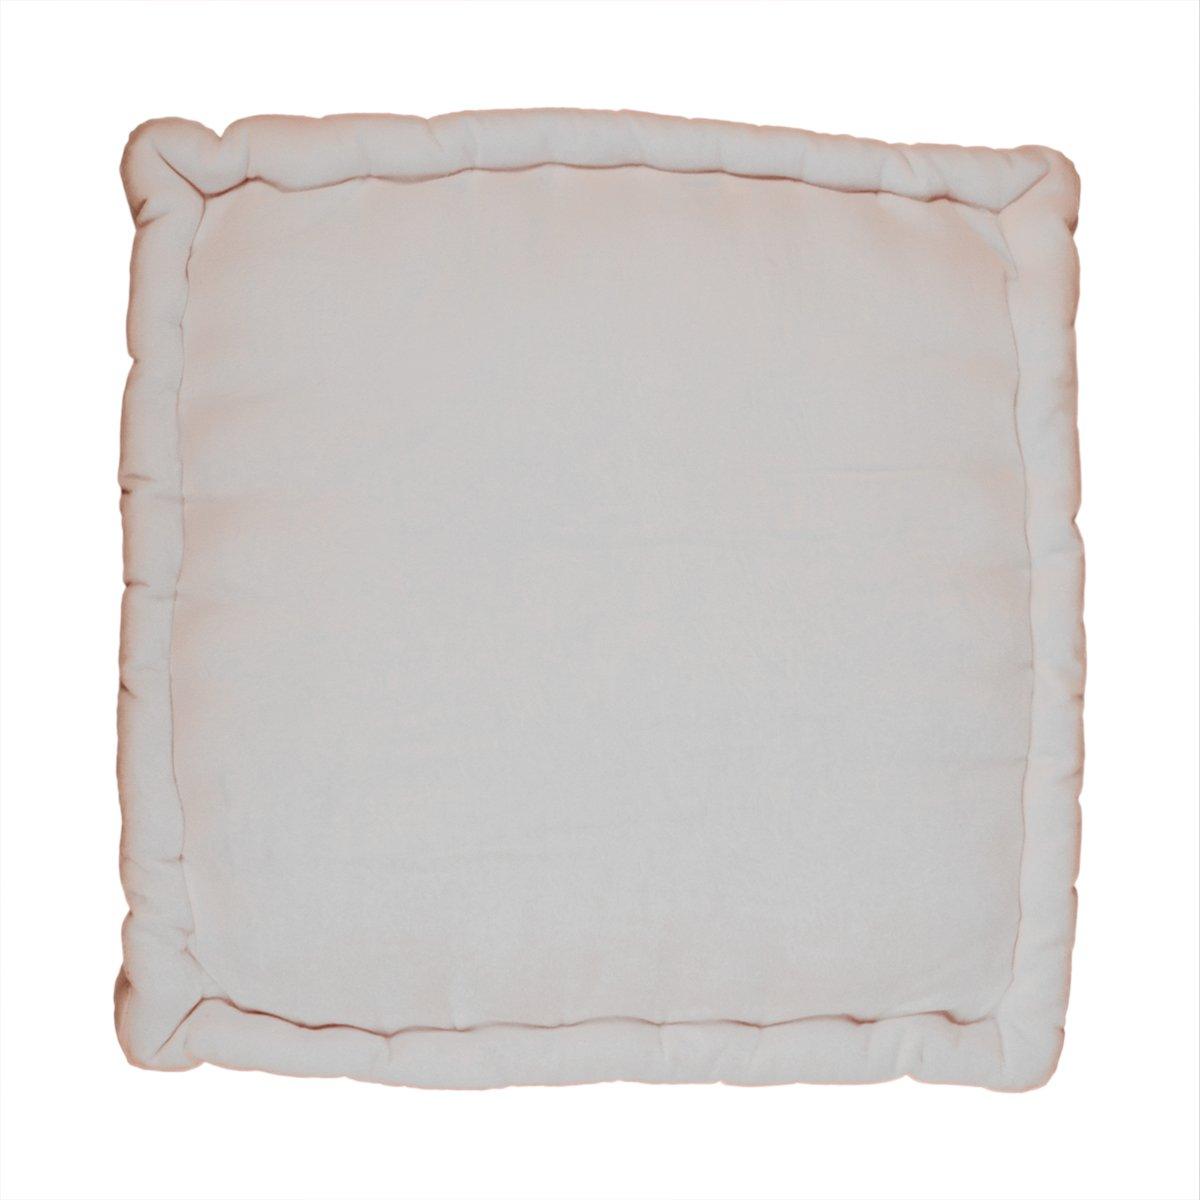 storeindya Floor Cushion Pillow Chunky Indoor Outdoor 100% Cotton Velvet Floor Cushion for Home Office (off White)